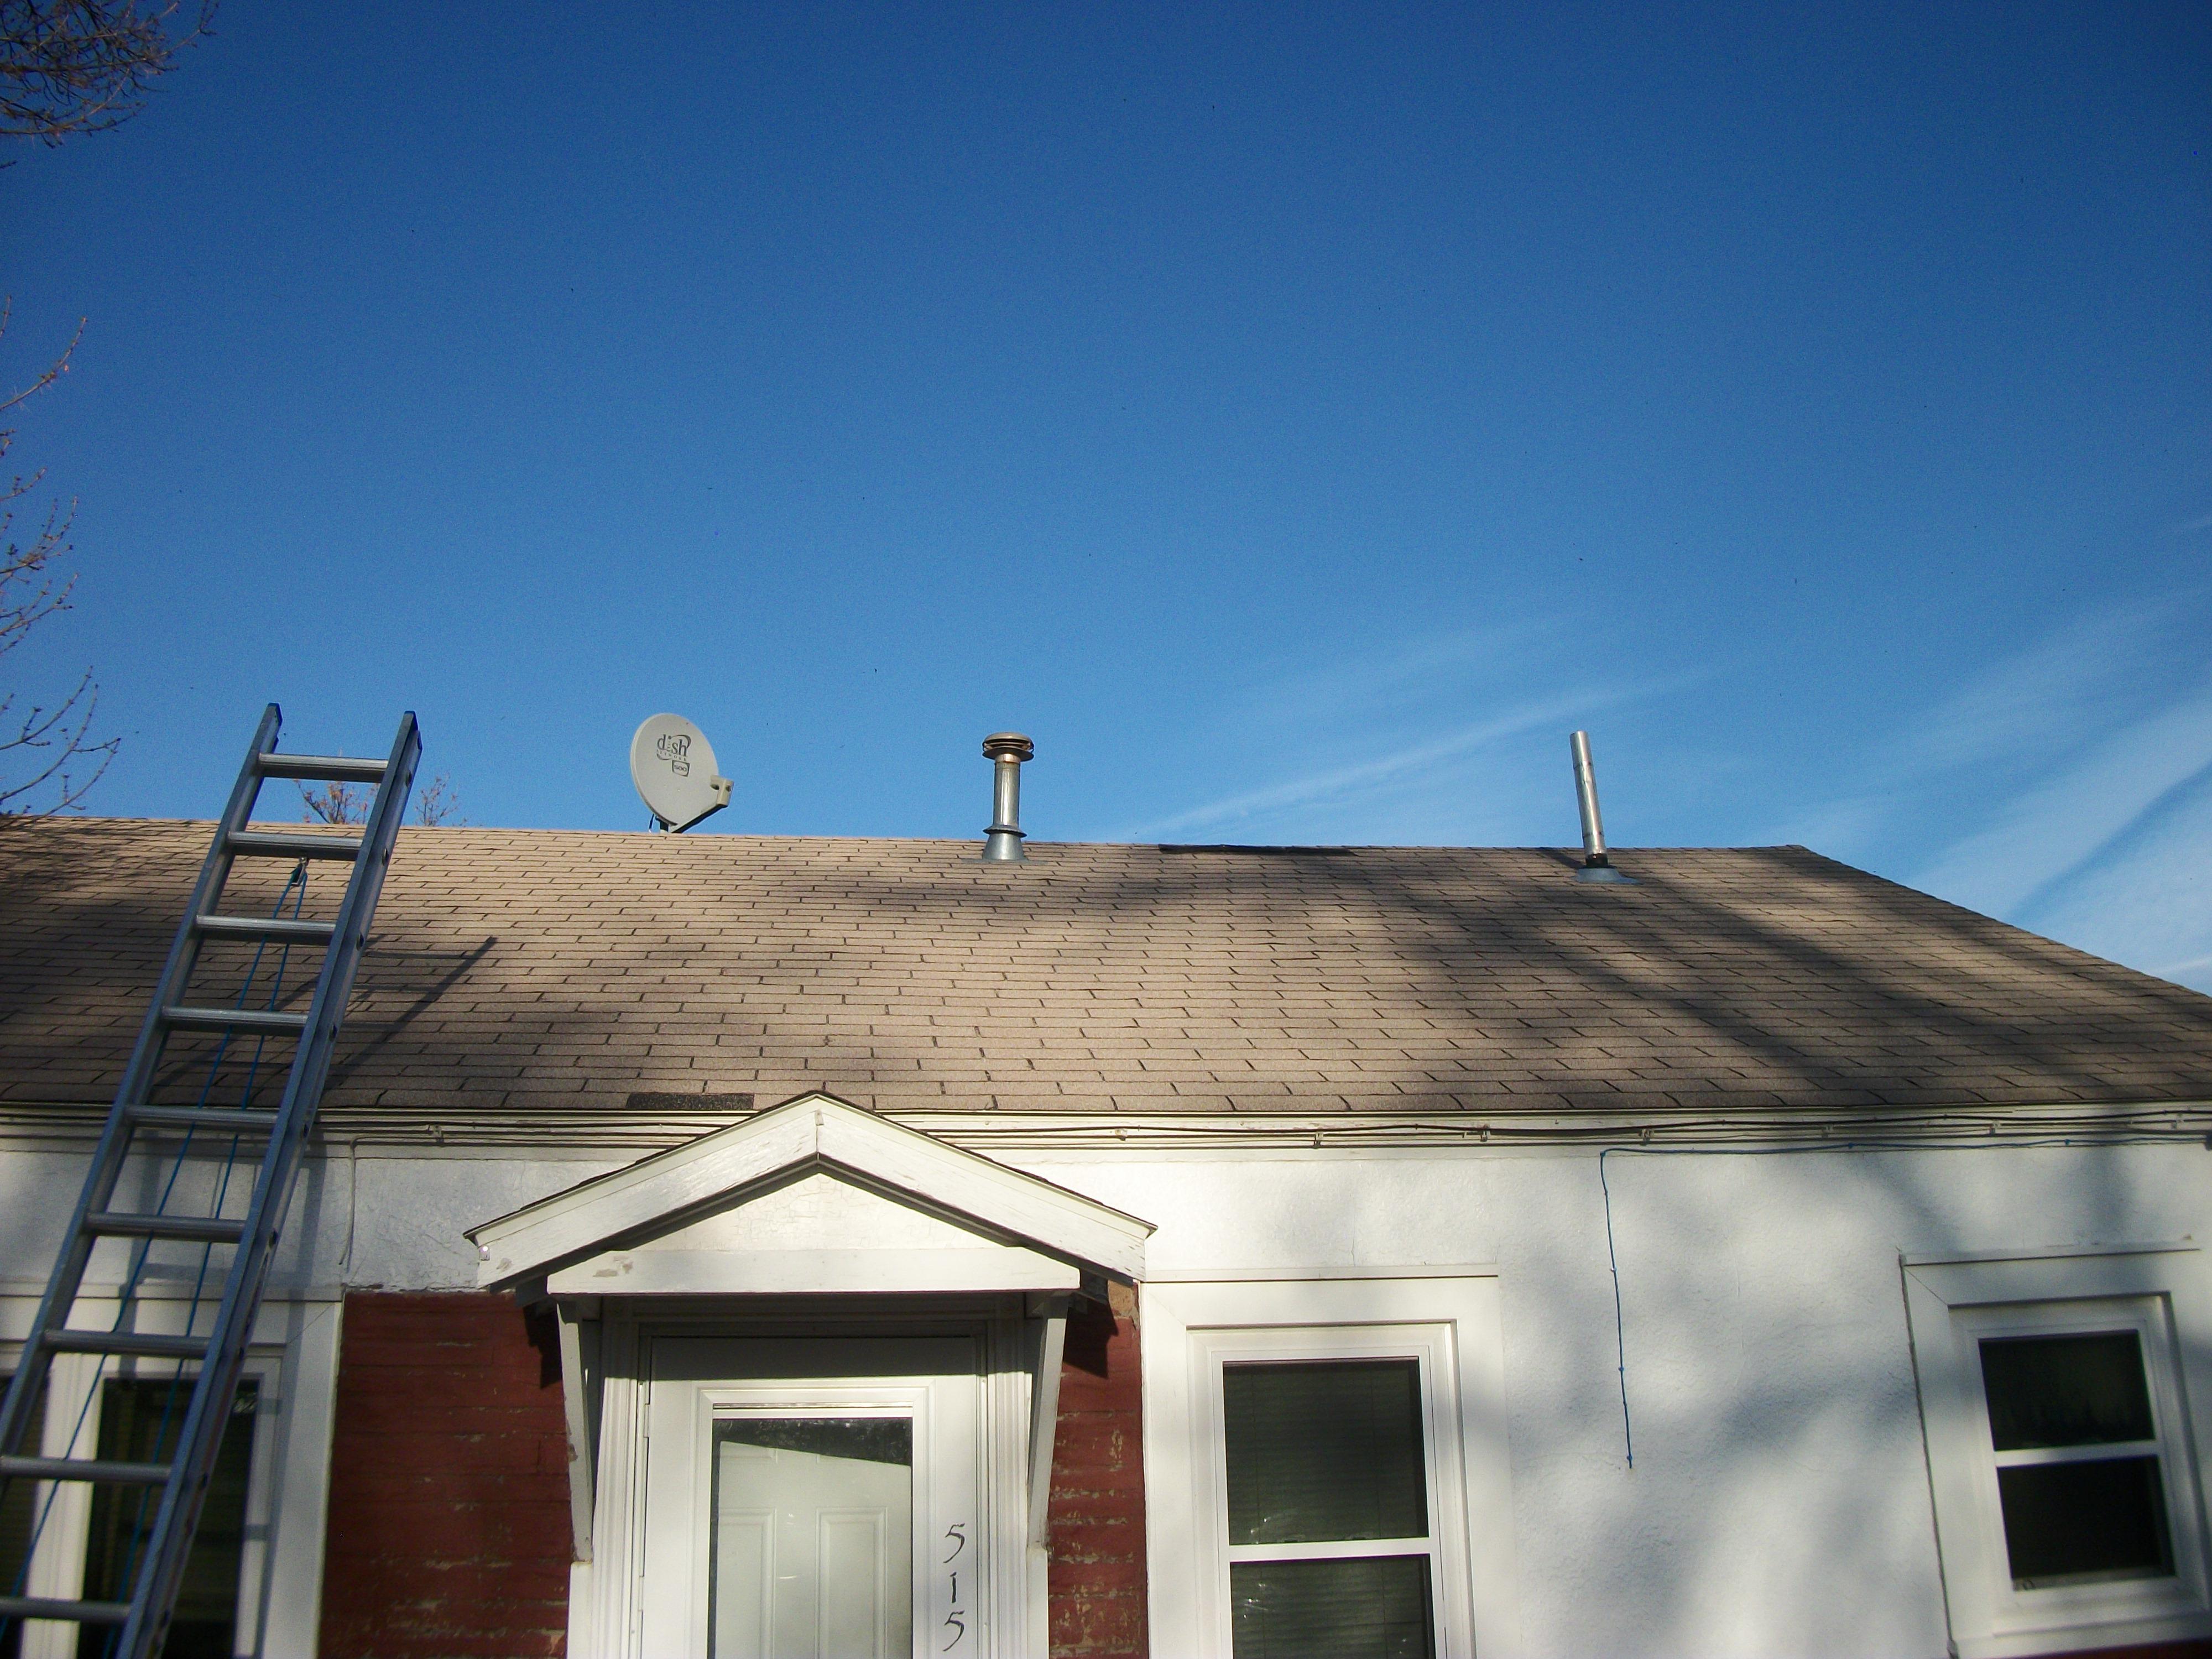 J&T roofing site inspection Laurel